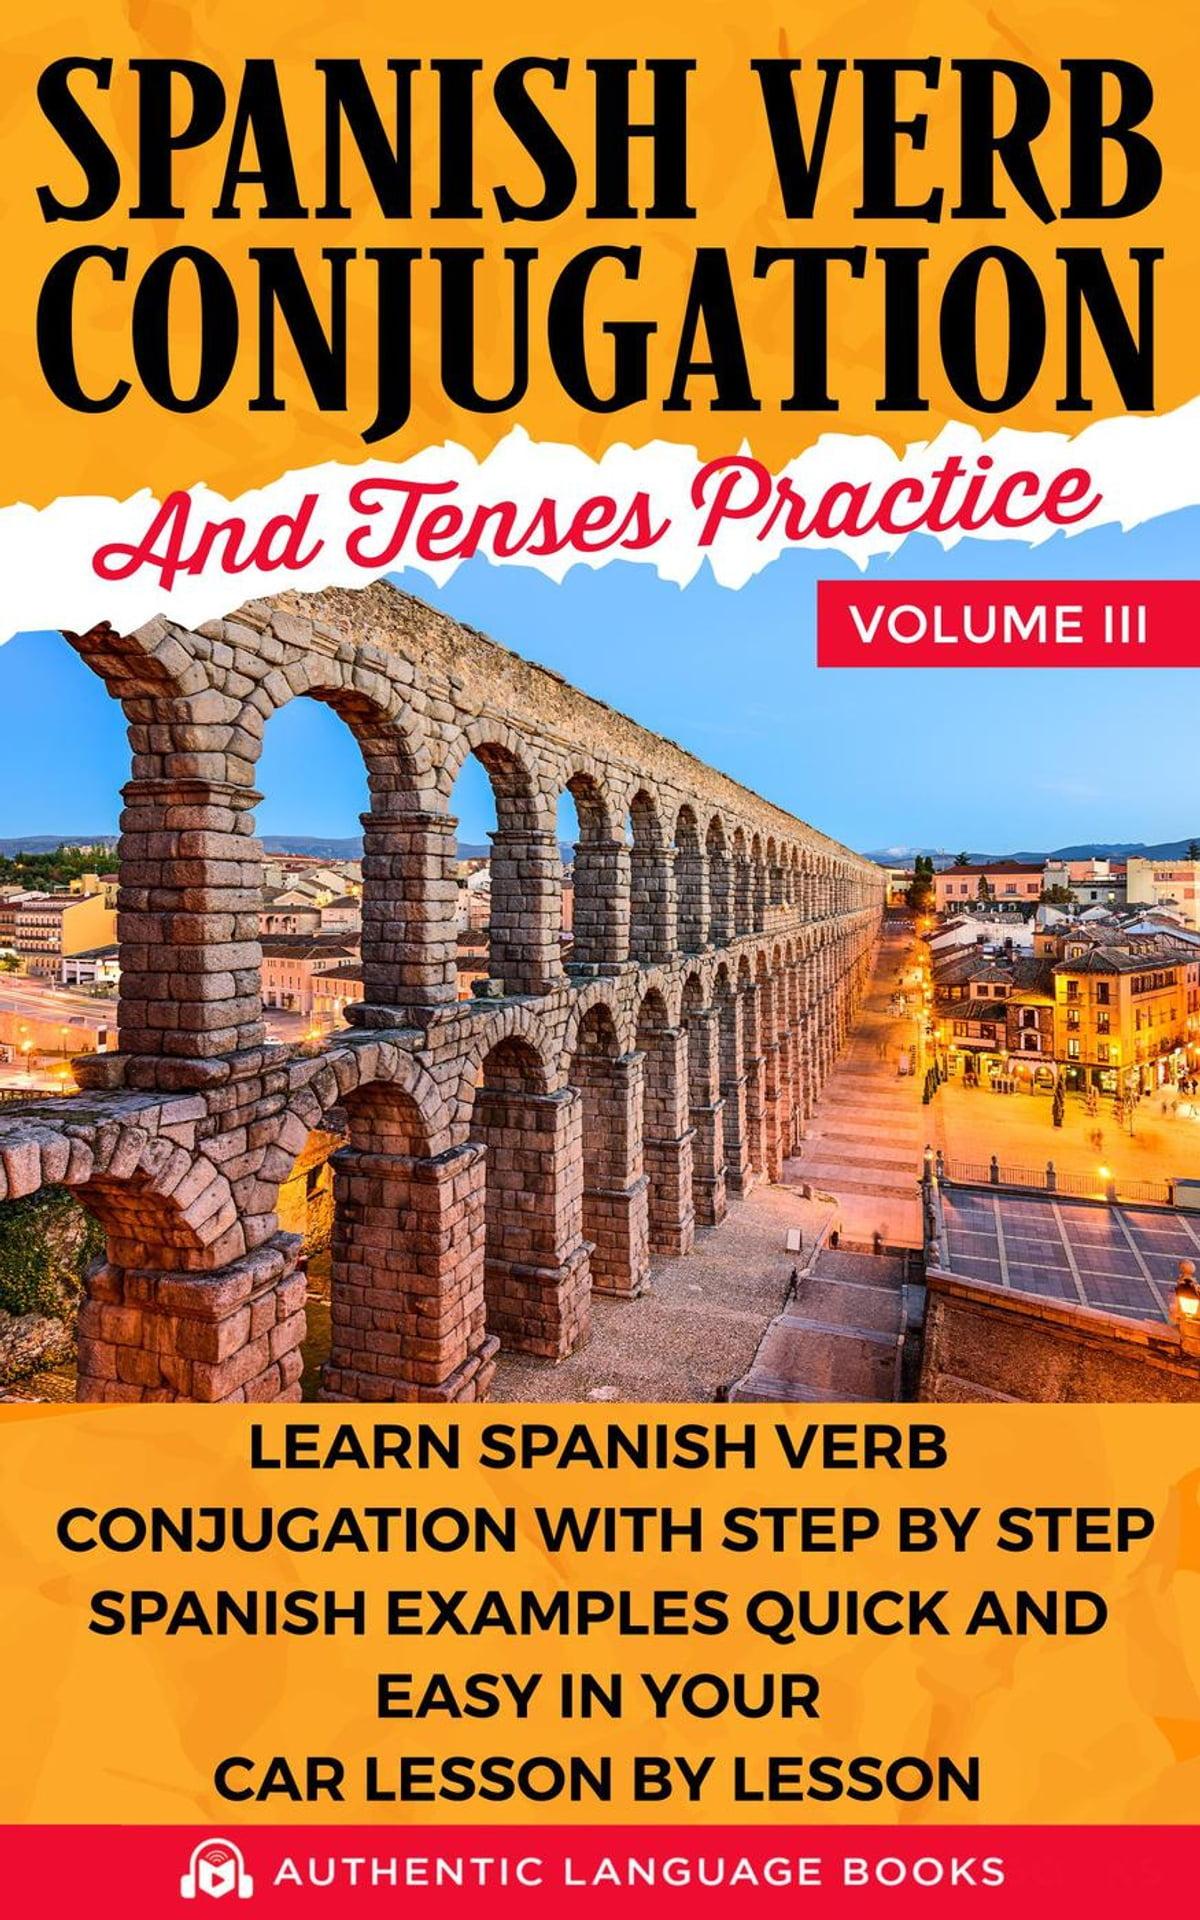 Spanish Verb Conjugation And Tenses Practice Volume Iii